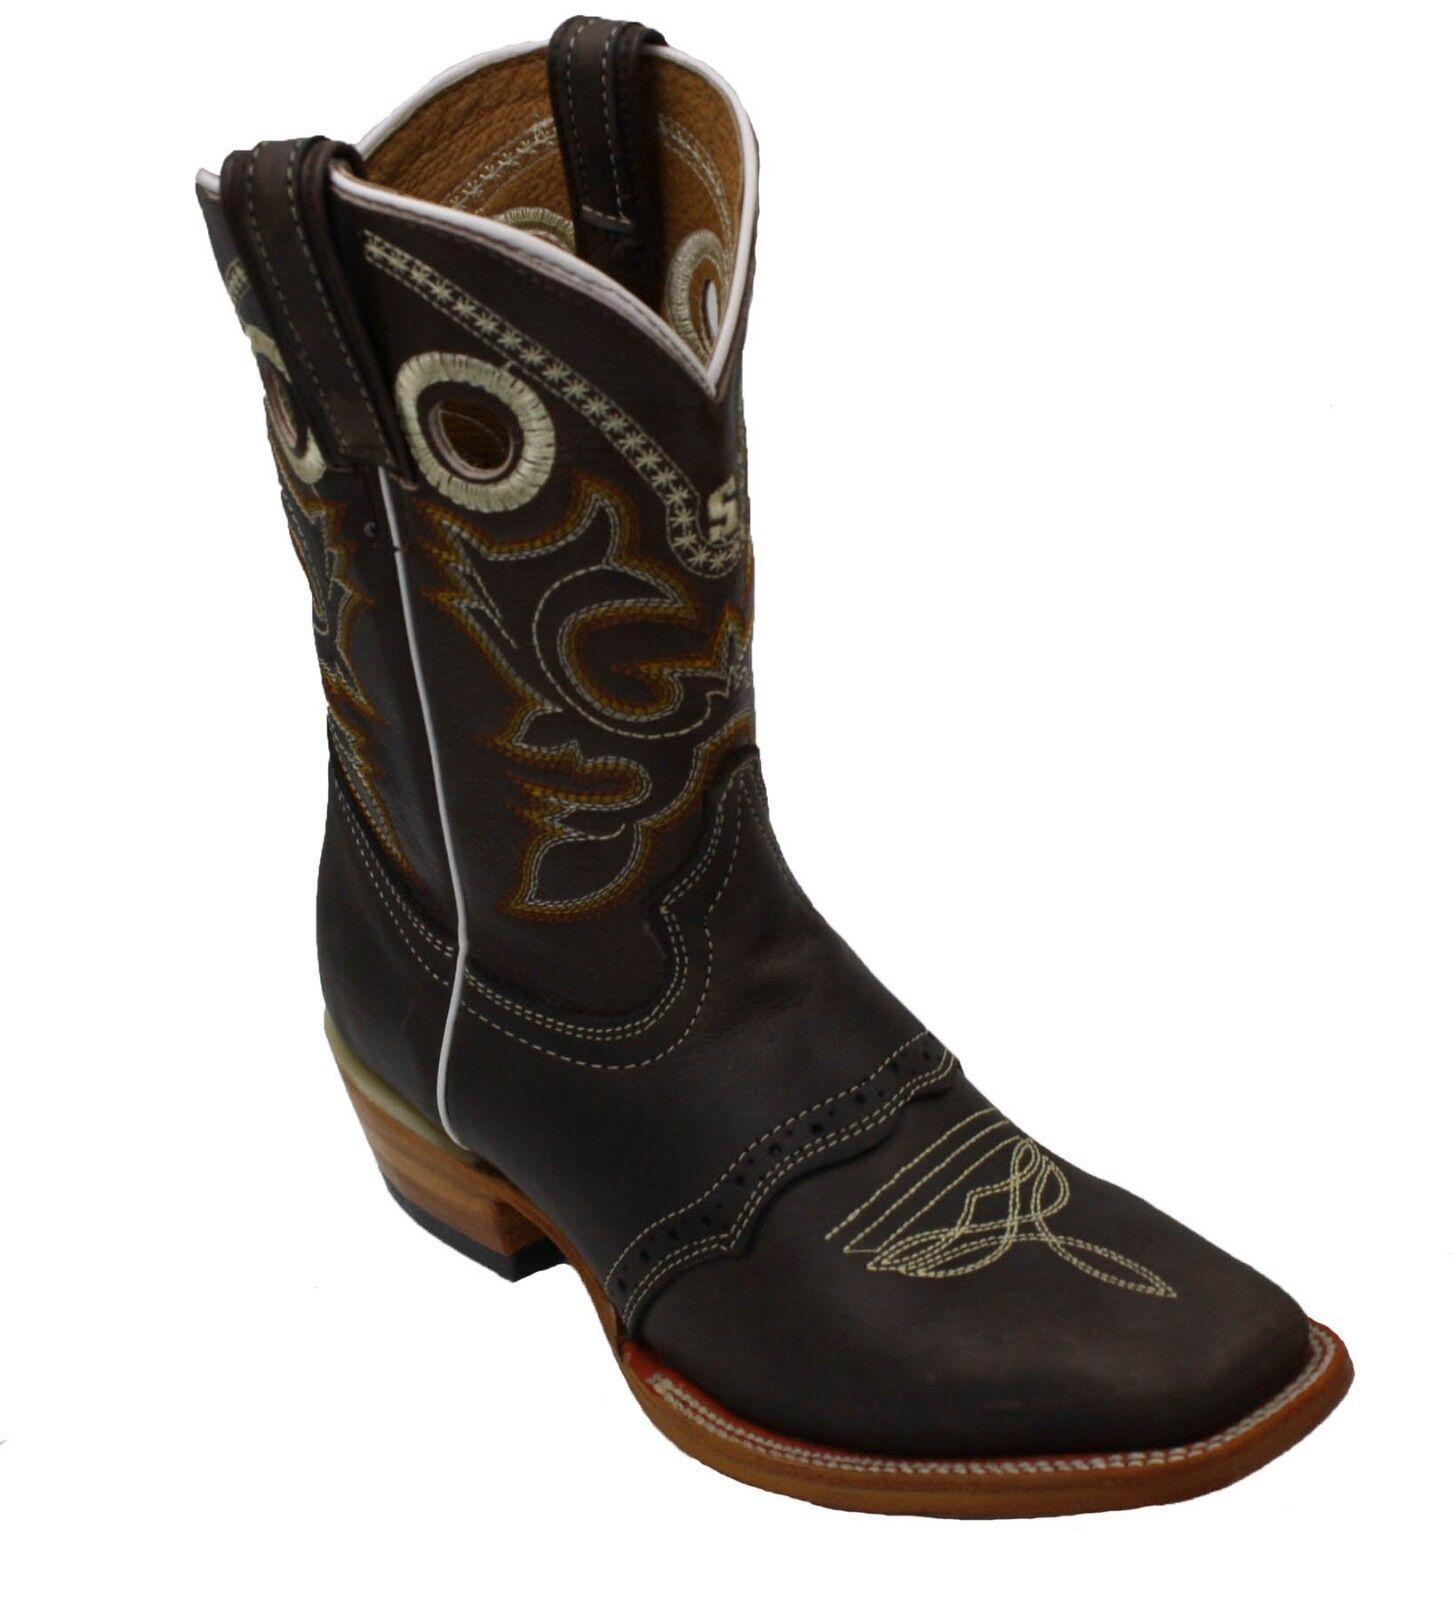 Women's Western Square Toe Toe Toe Cowgirl Boot - De Dama Vaquero Cafe Bota-Brand New 53c5b3